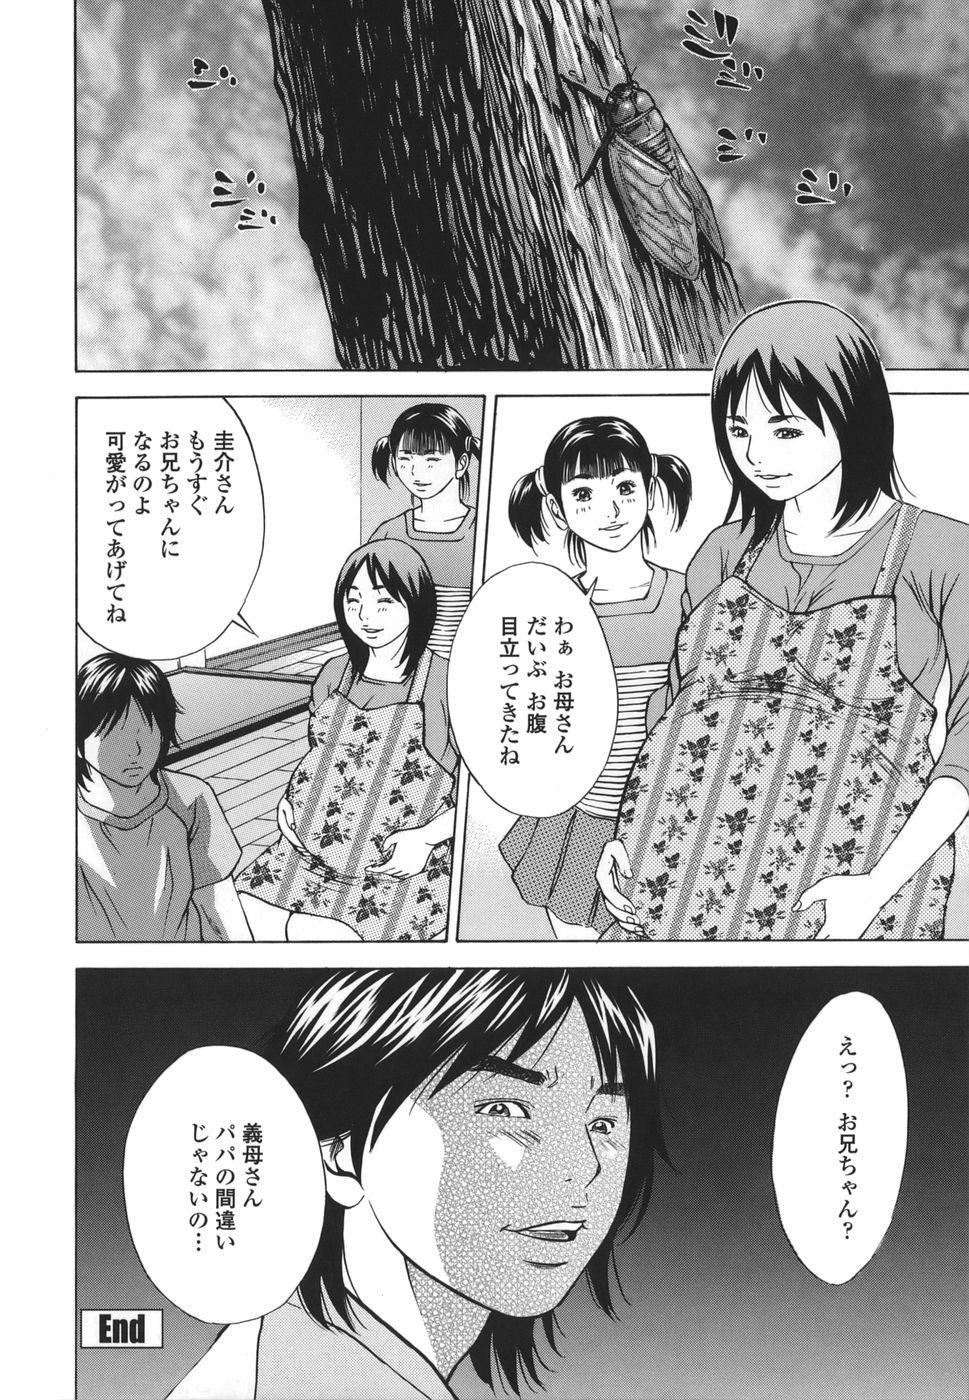 Kinshin Goukan - Near Relation Rapes 211